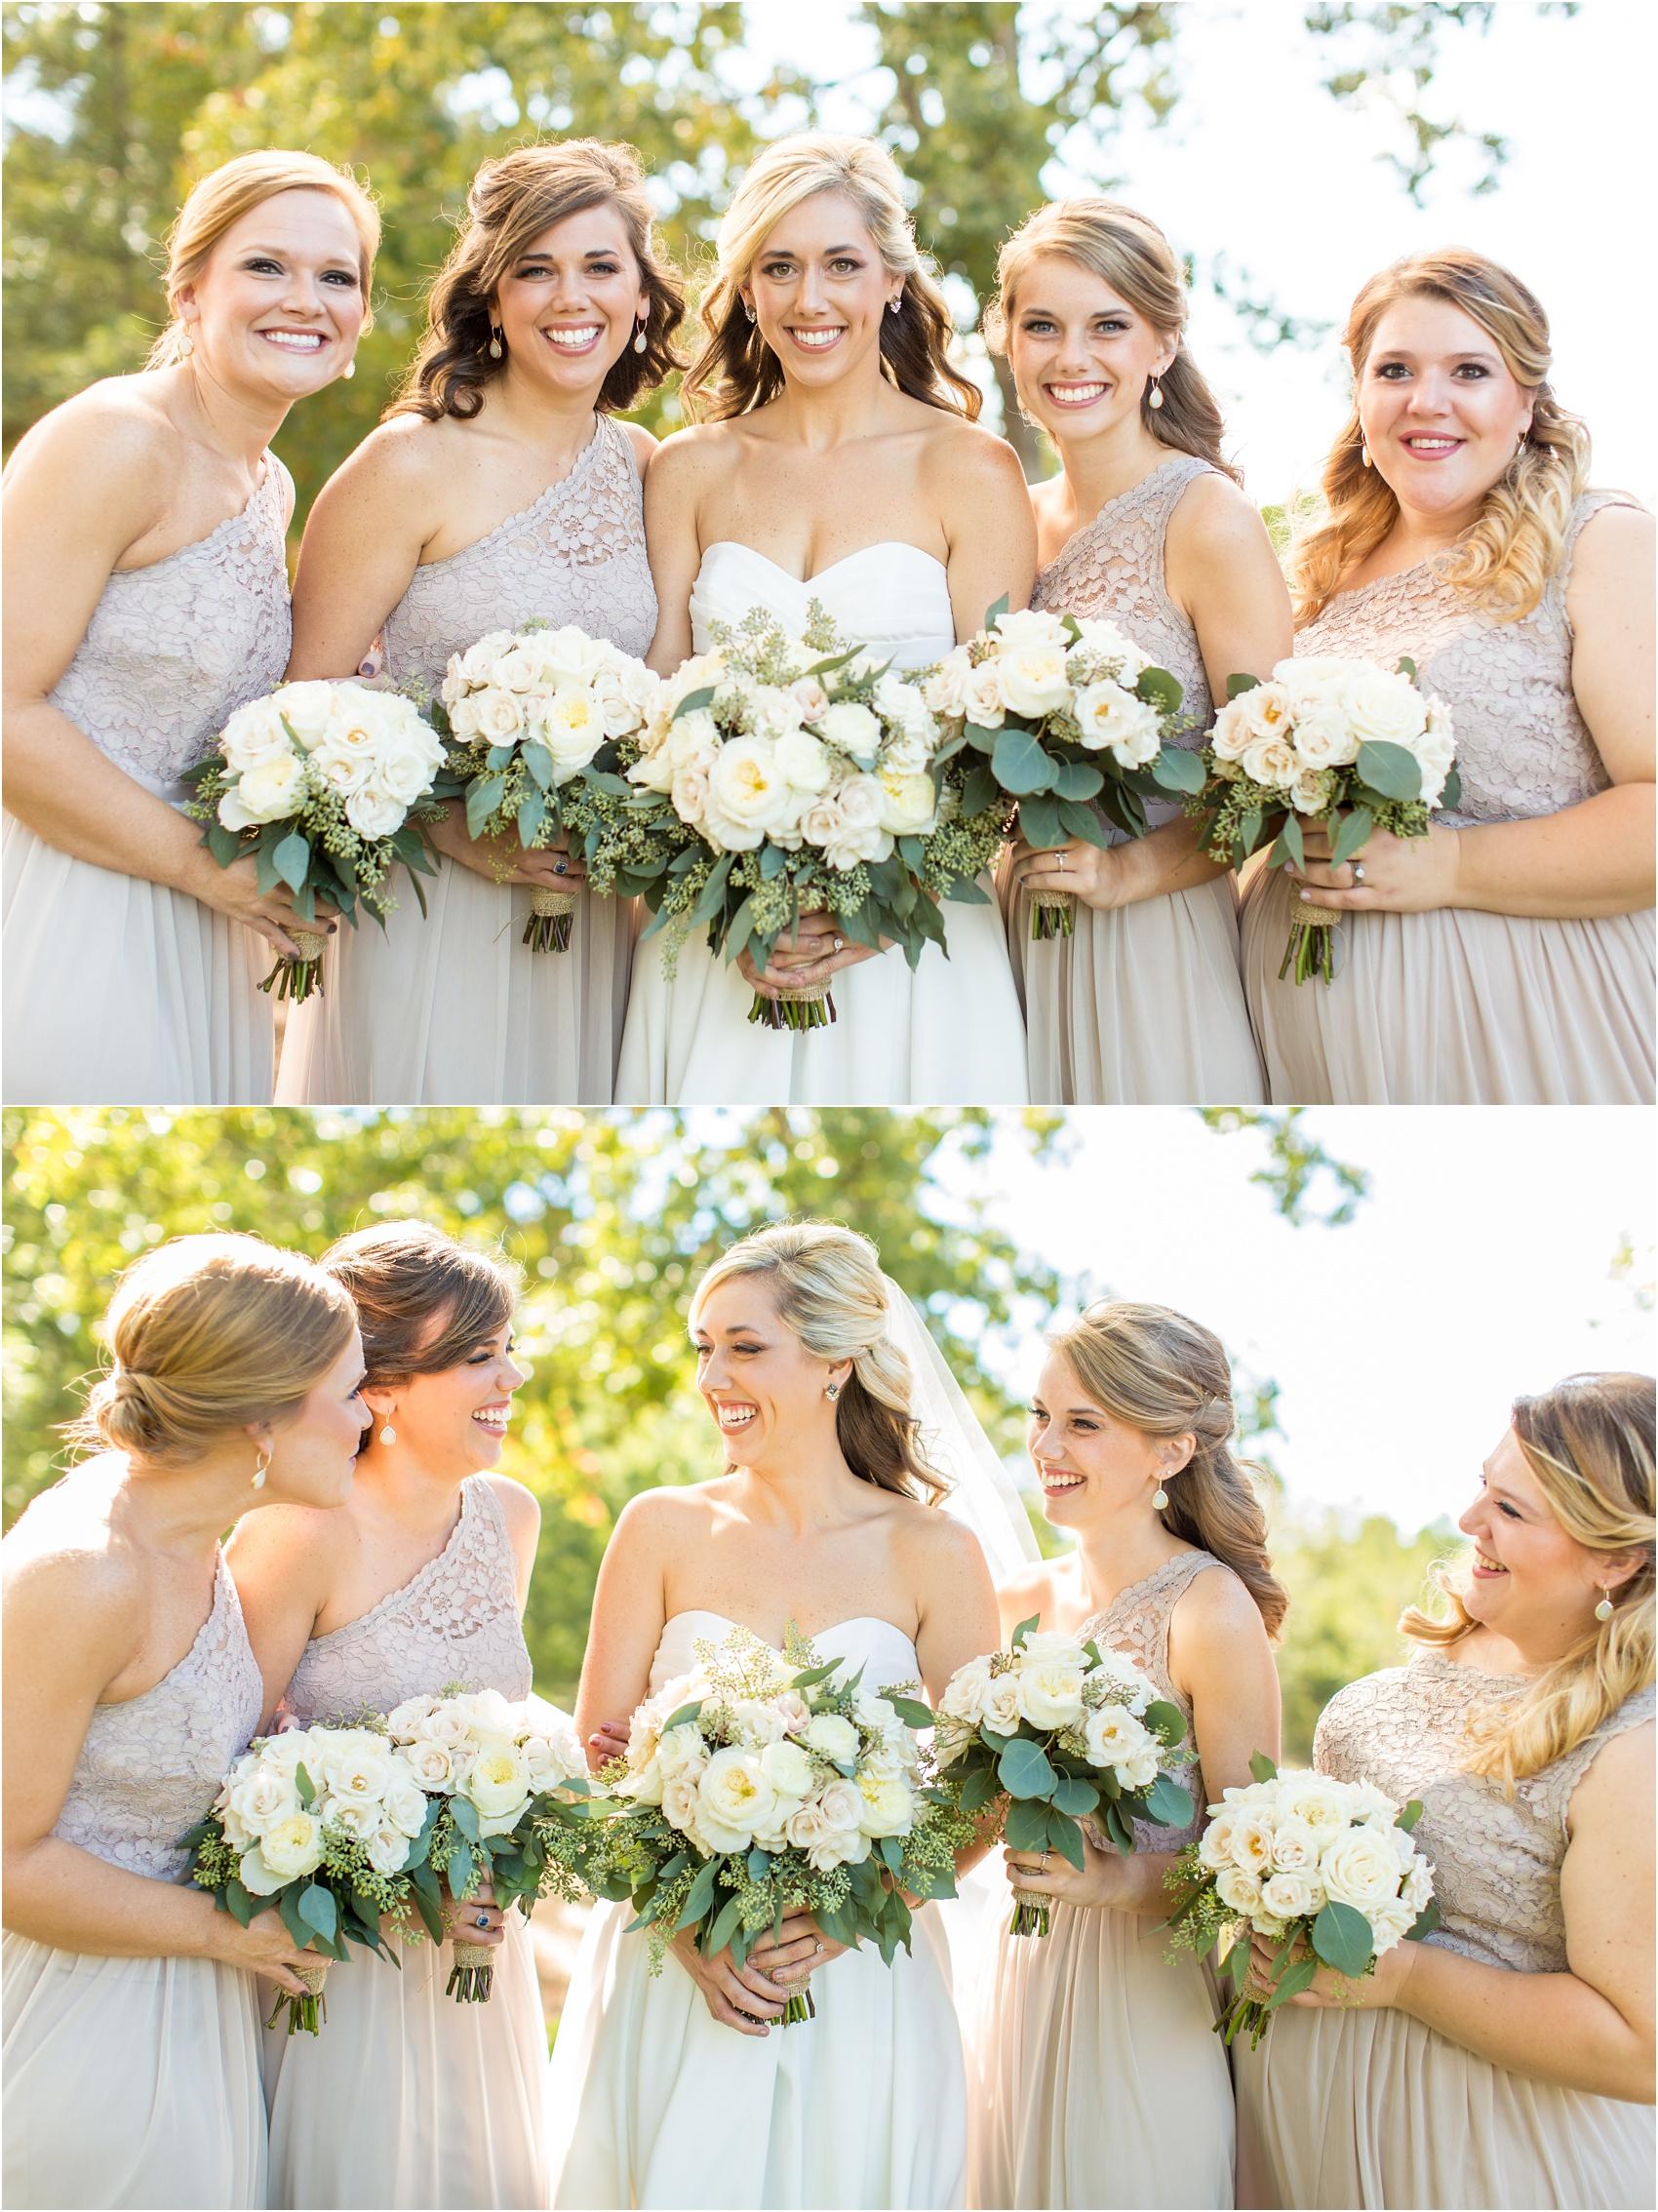 Savannah Eve Photography- Spencer Wedding- Blog-4.jpg